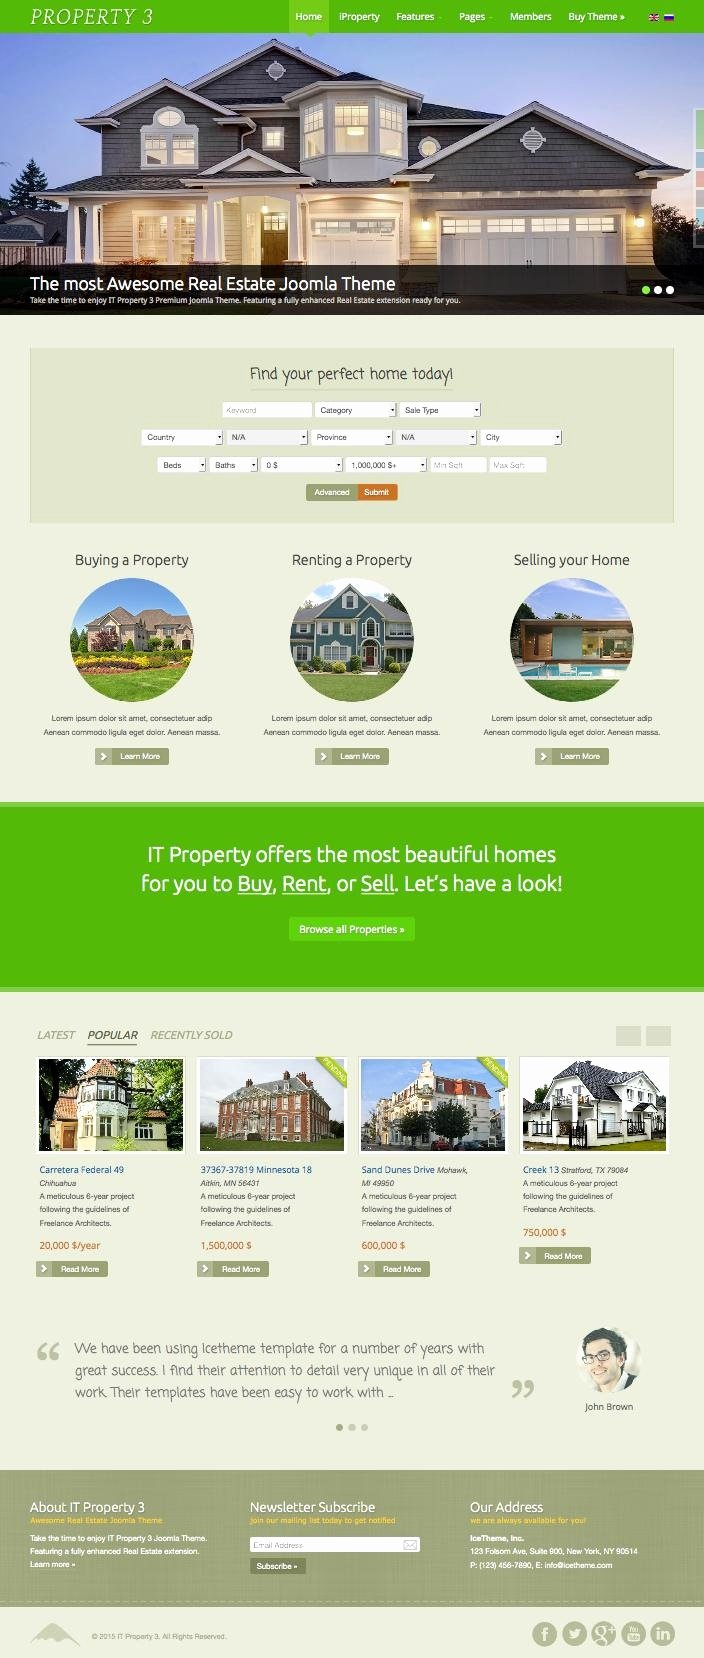 Joomla Real Estate Template Elegant It Property 3 Joomla Real Estate Template for Buy Rent & Sell